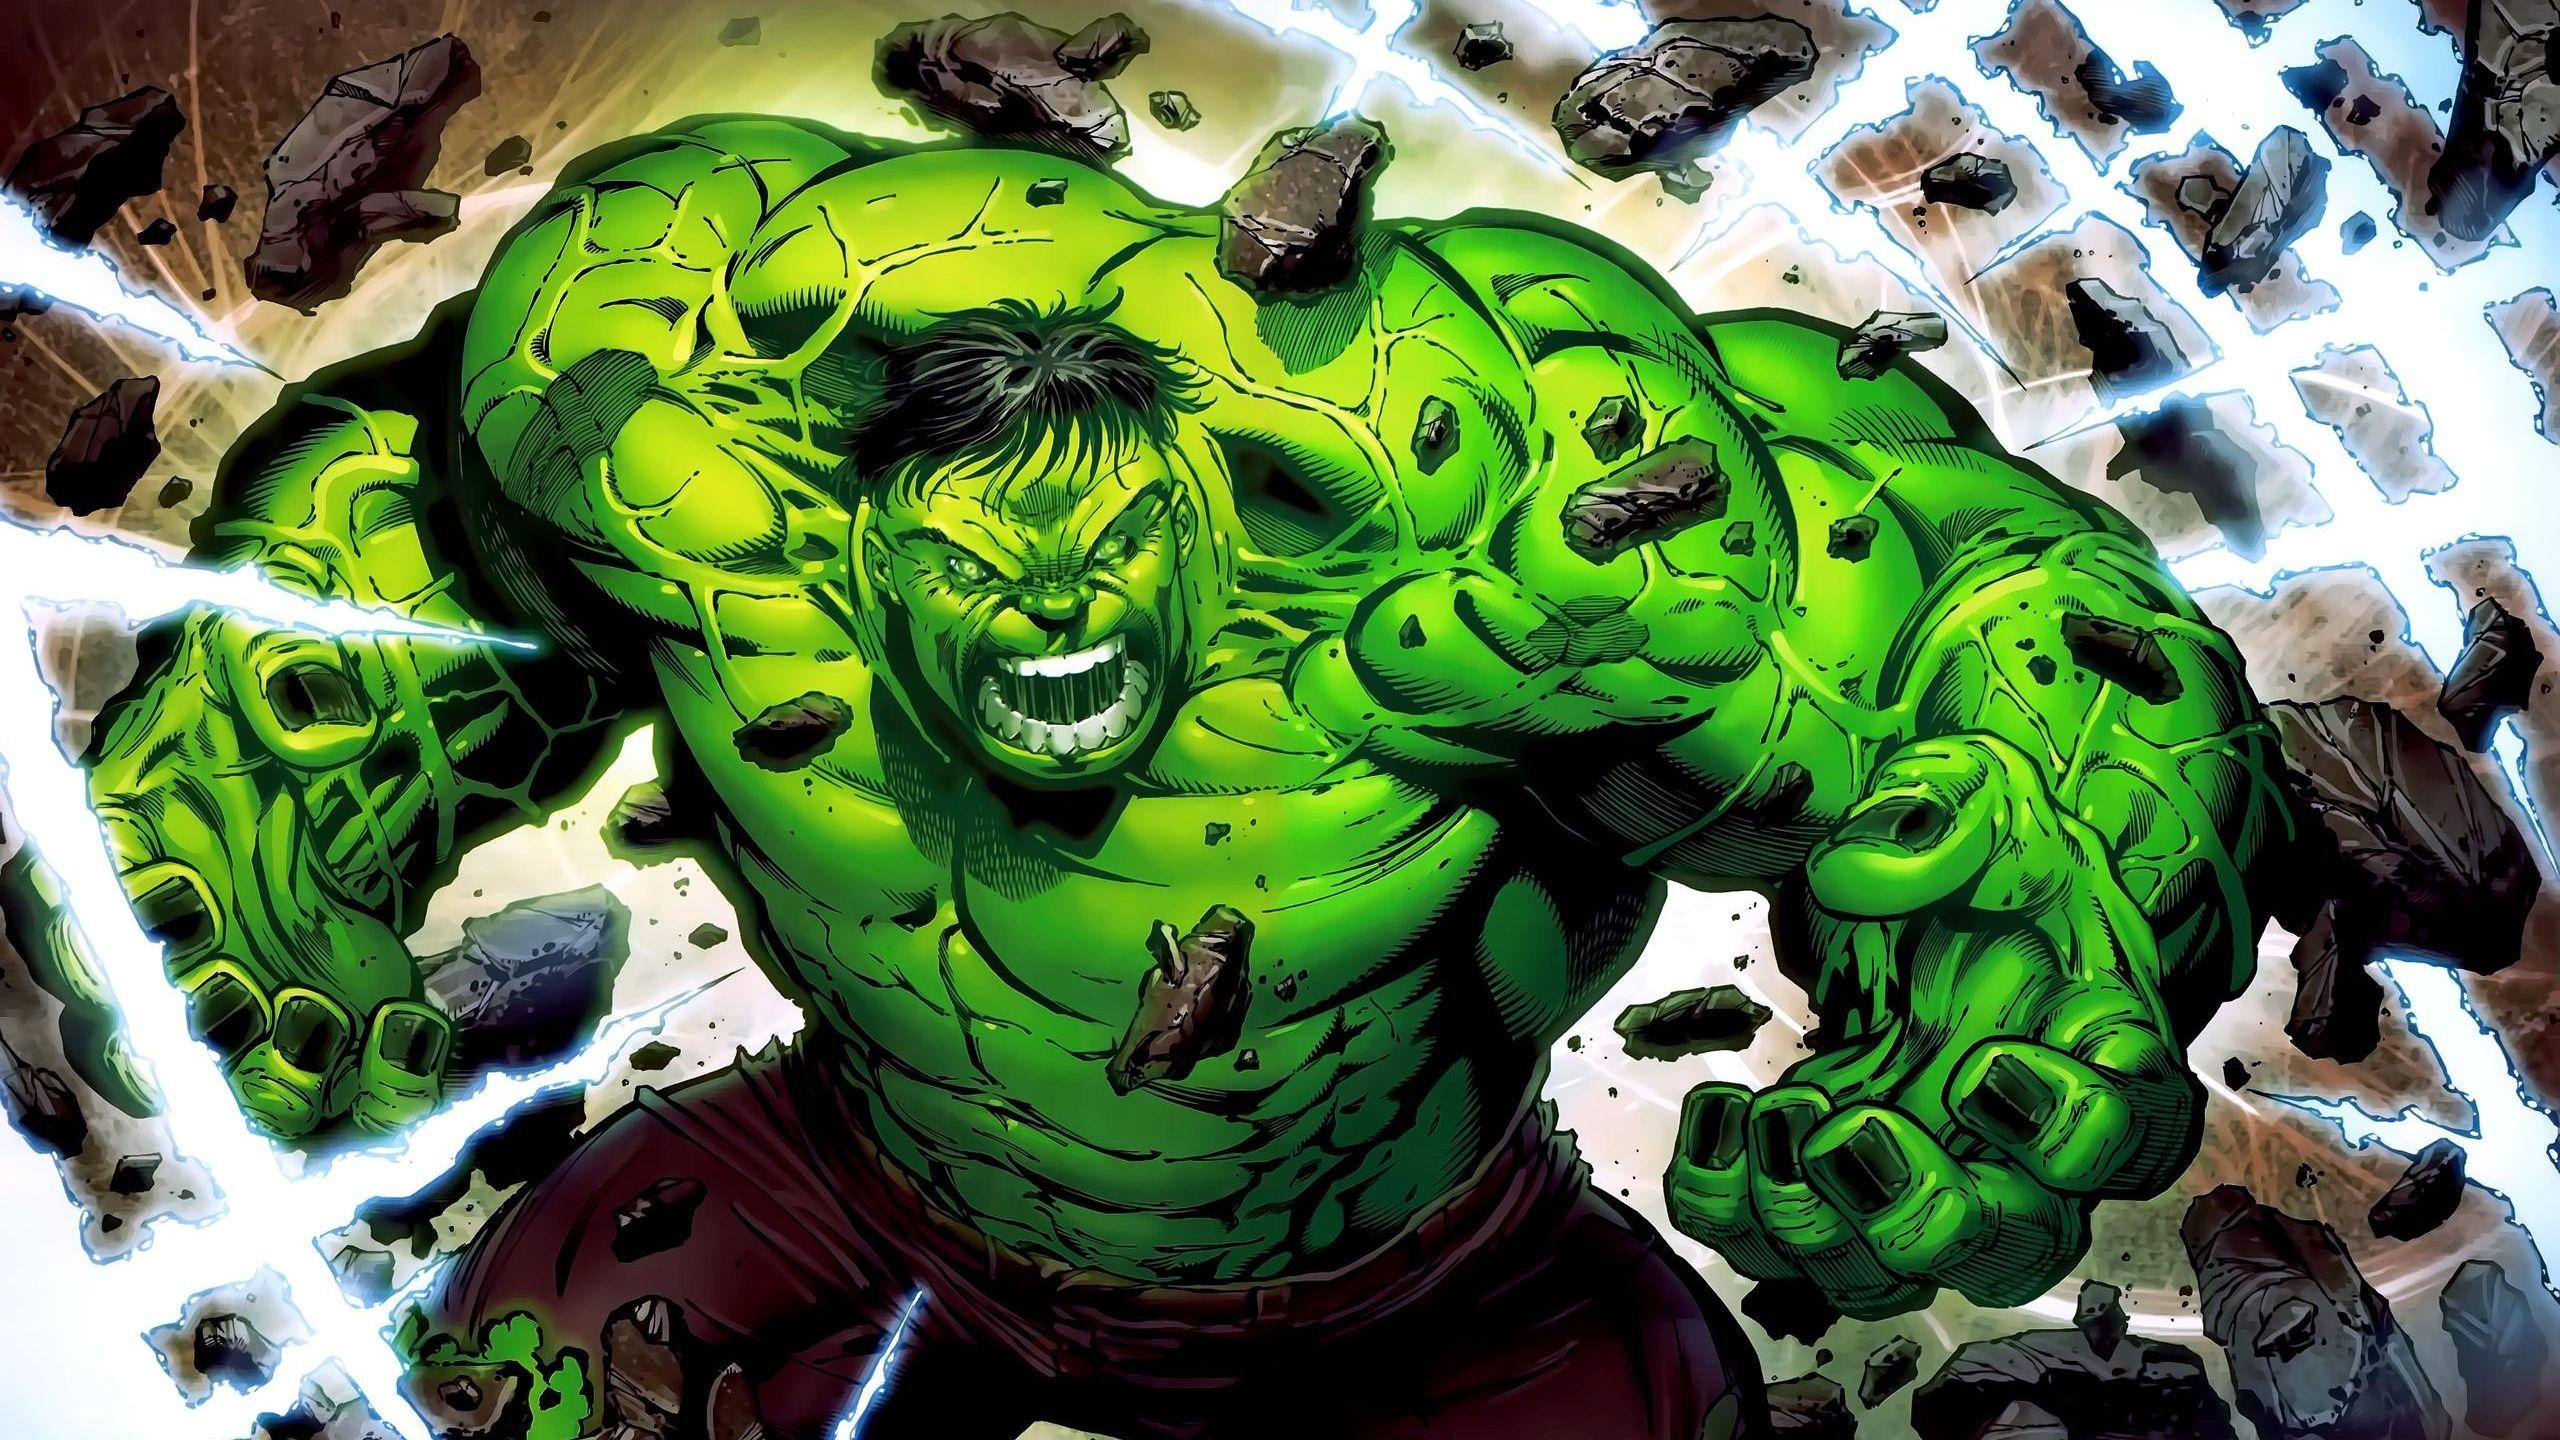 Cool Wallpaper Marvel The Incredible Hulk - 0e1b1a8020dc6f0a8c8f3daa15081202  Gallery_13534.jpg